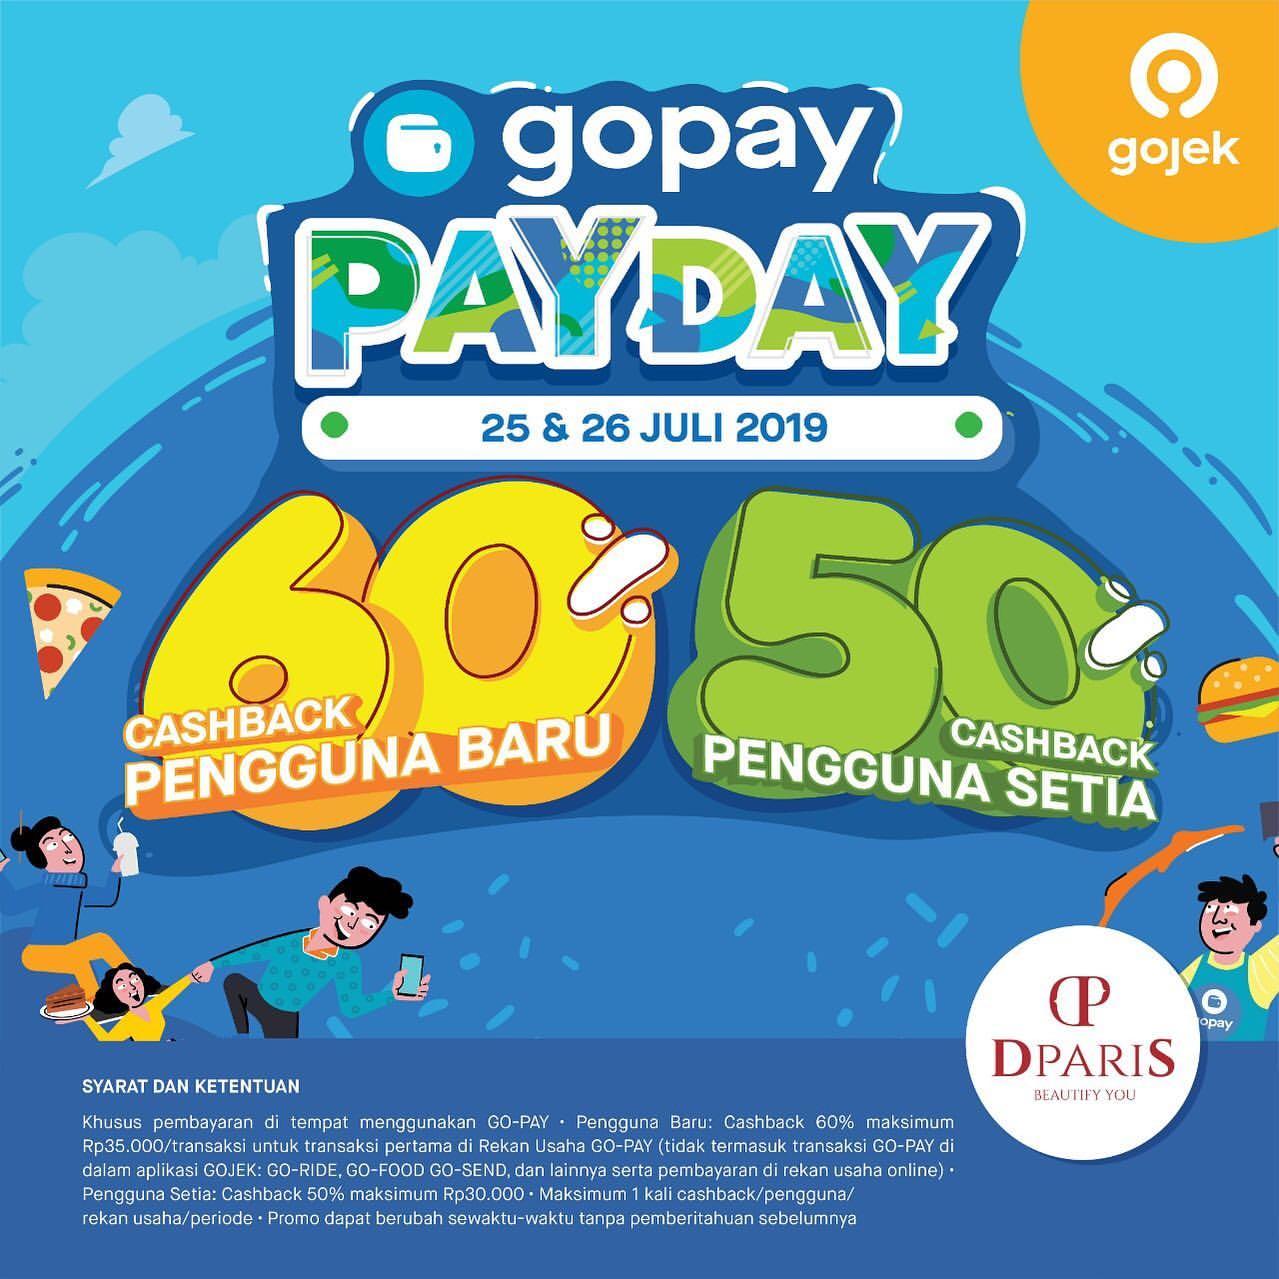 Diskon DPARIS Promo GOPAY PAYDAY, Cashback up to 60%!